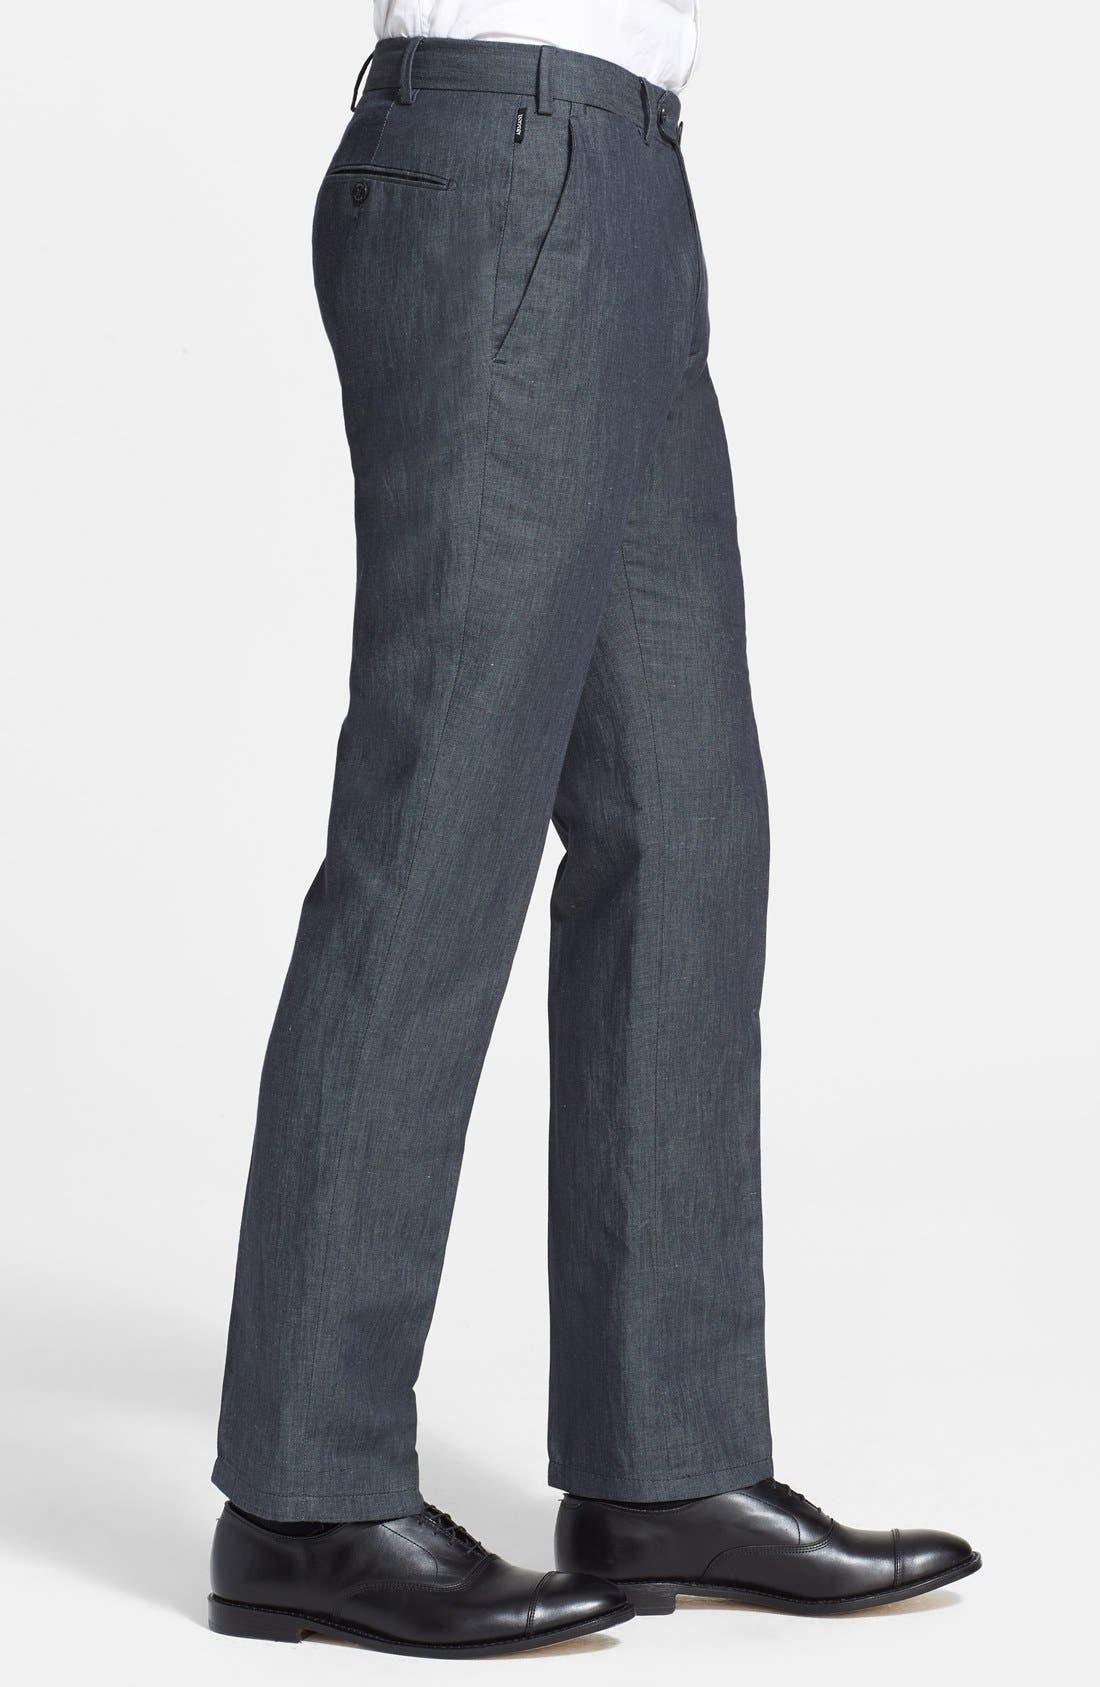 Armani Collezioni Flax & Cotton Flat Front Trousers,                             Alternate thumbnail 2, color,                             034